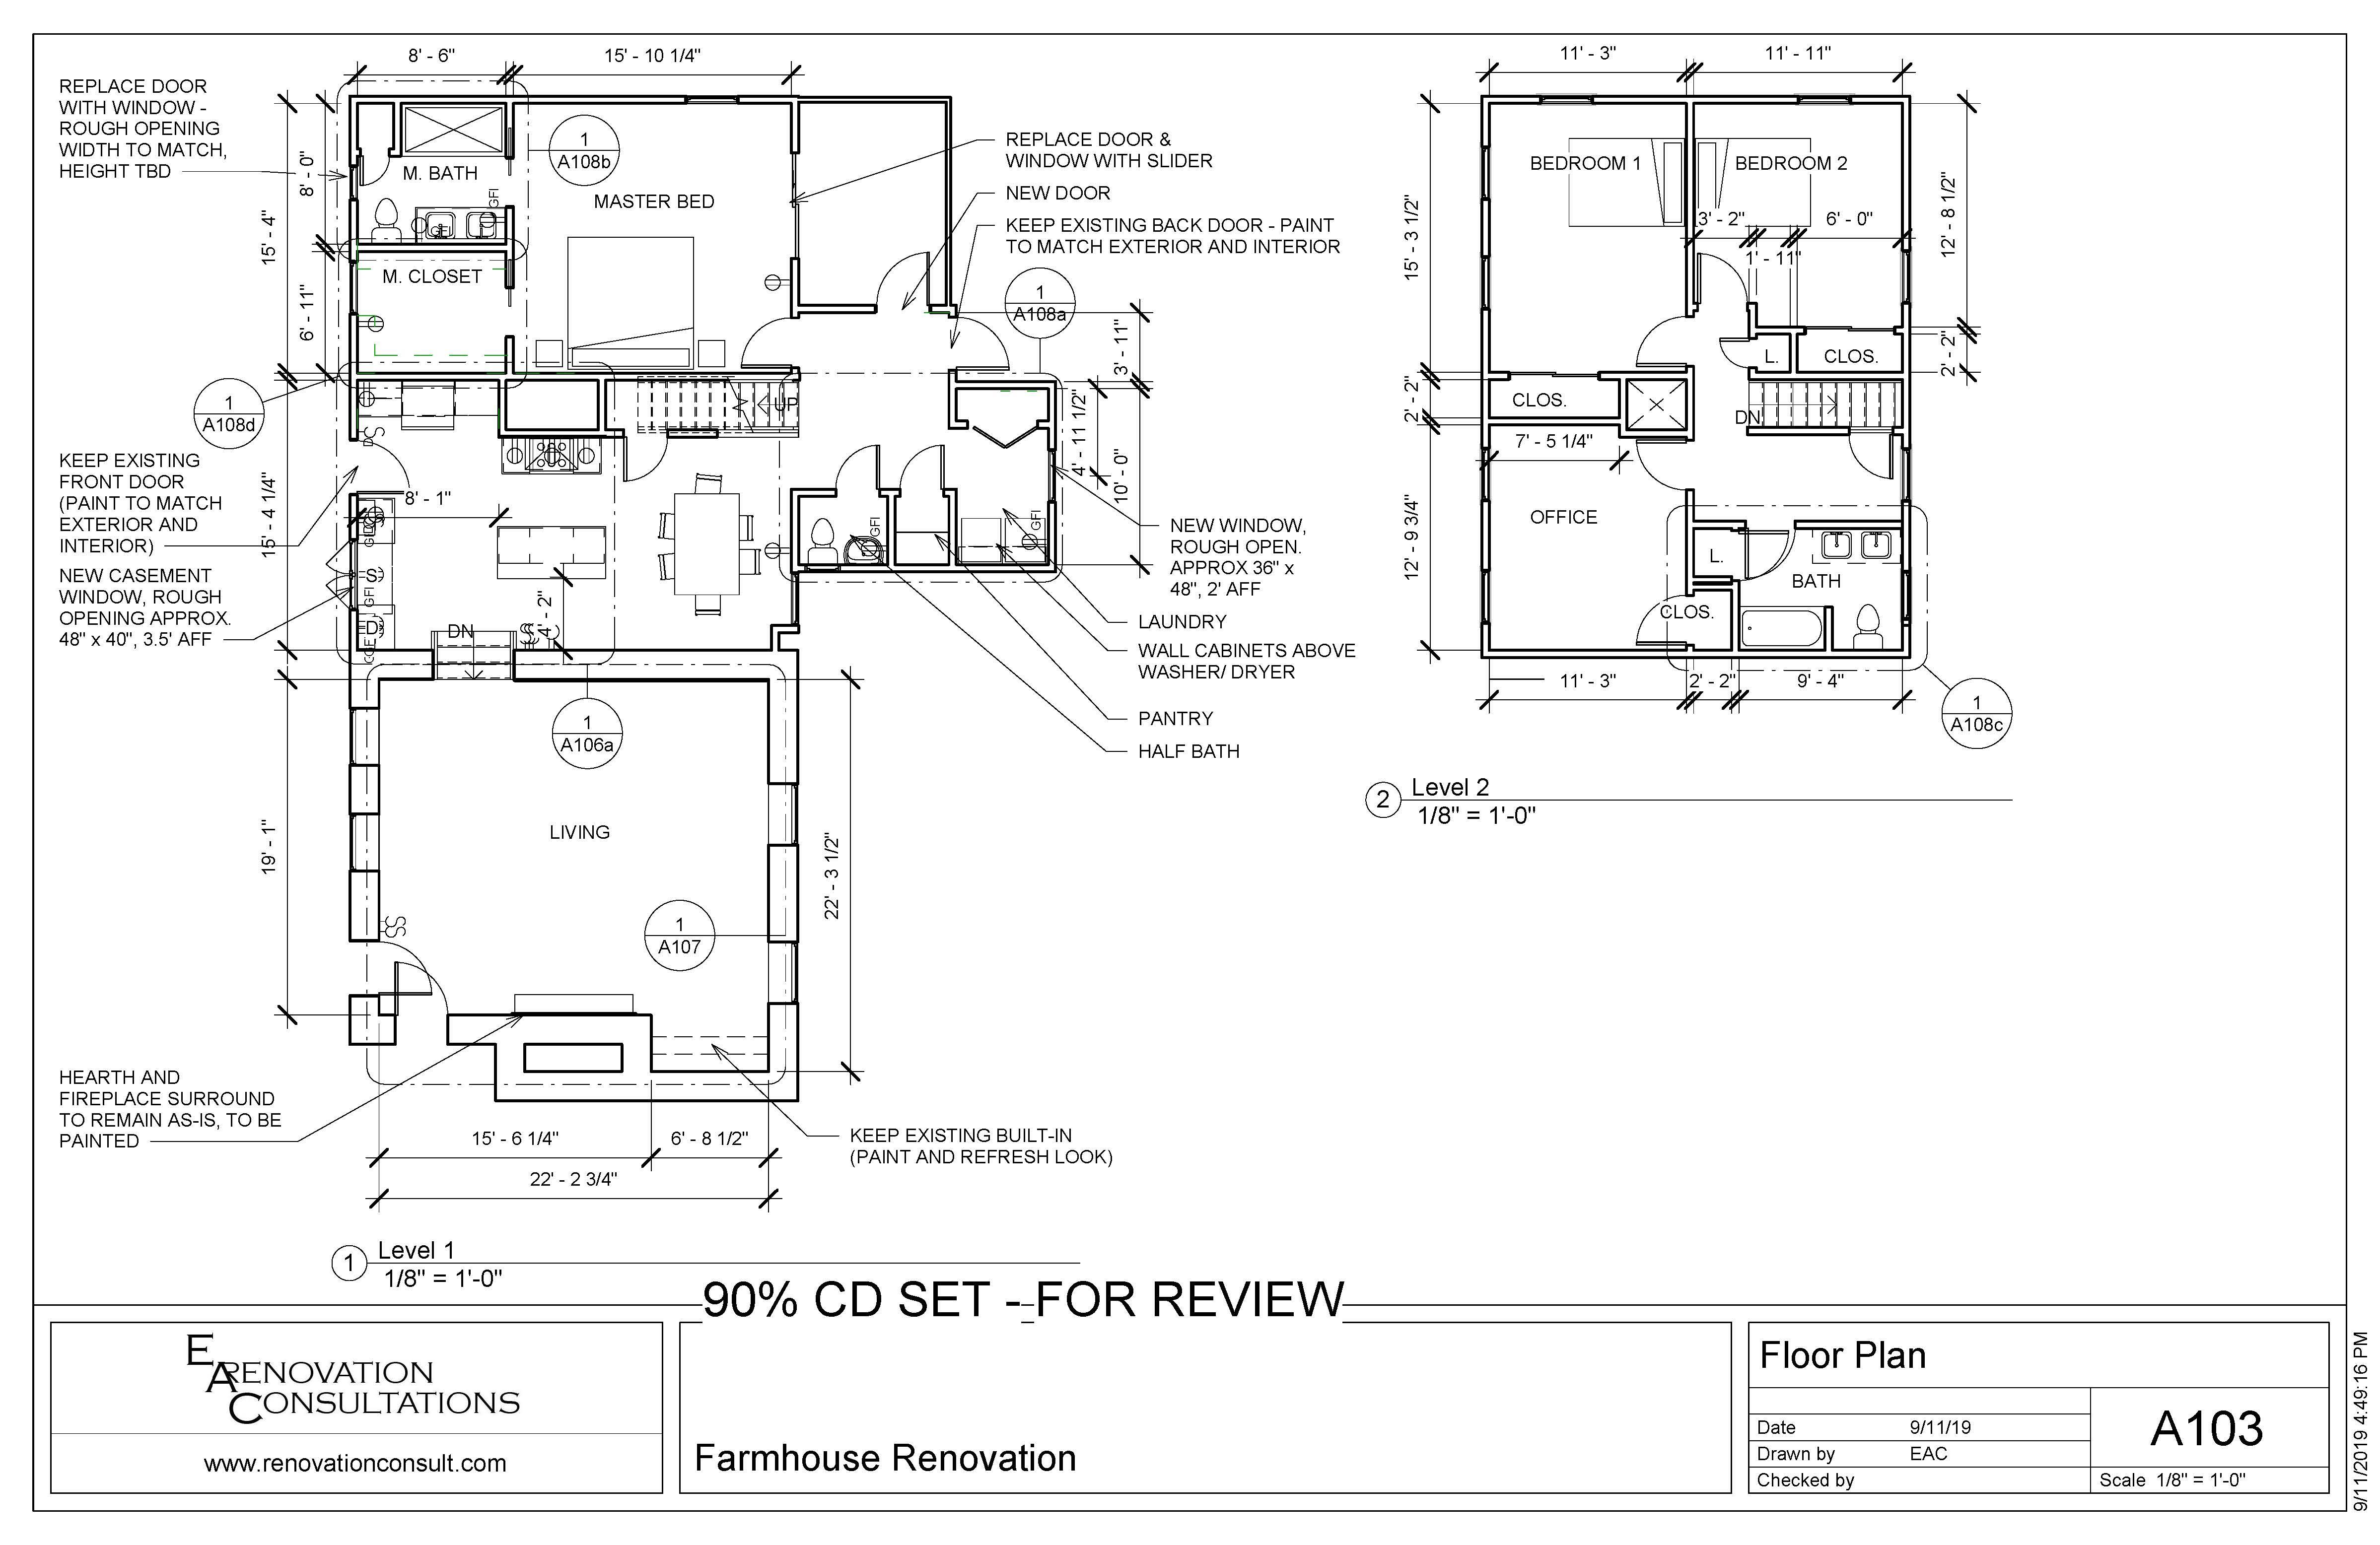 Construction doc example 1b